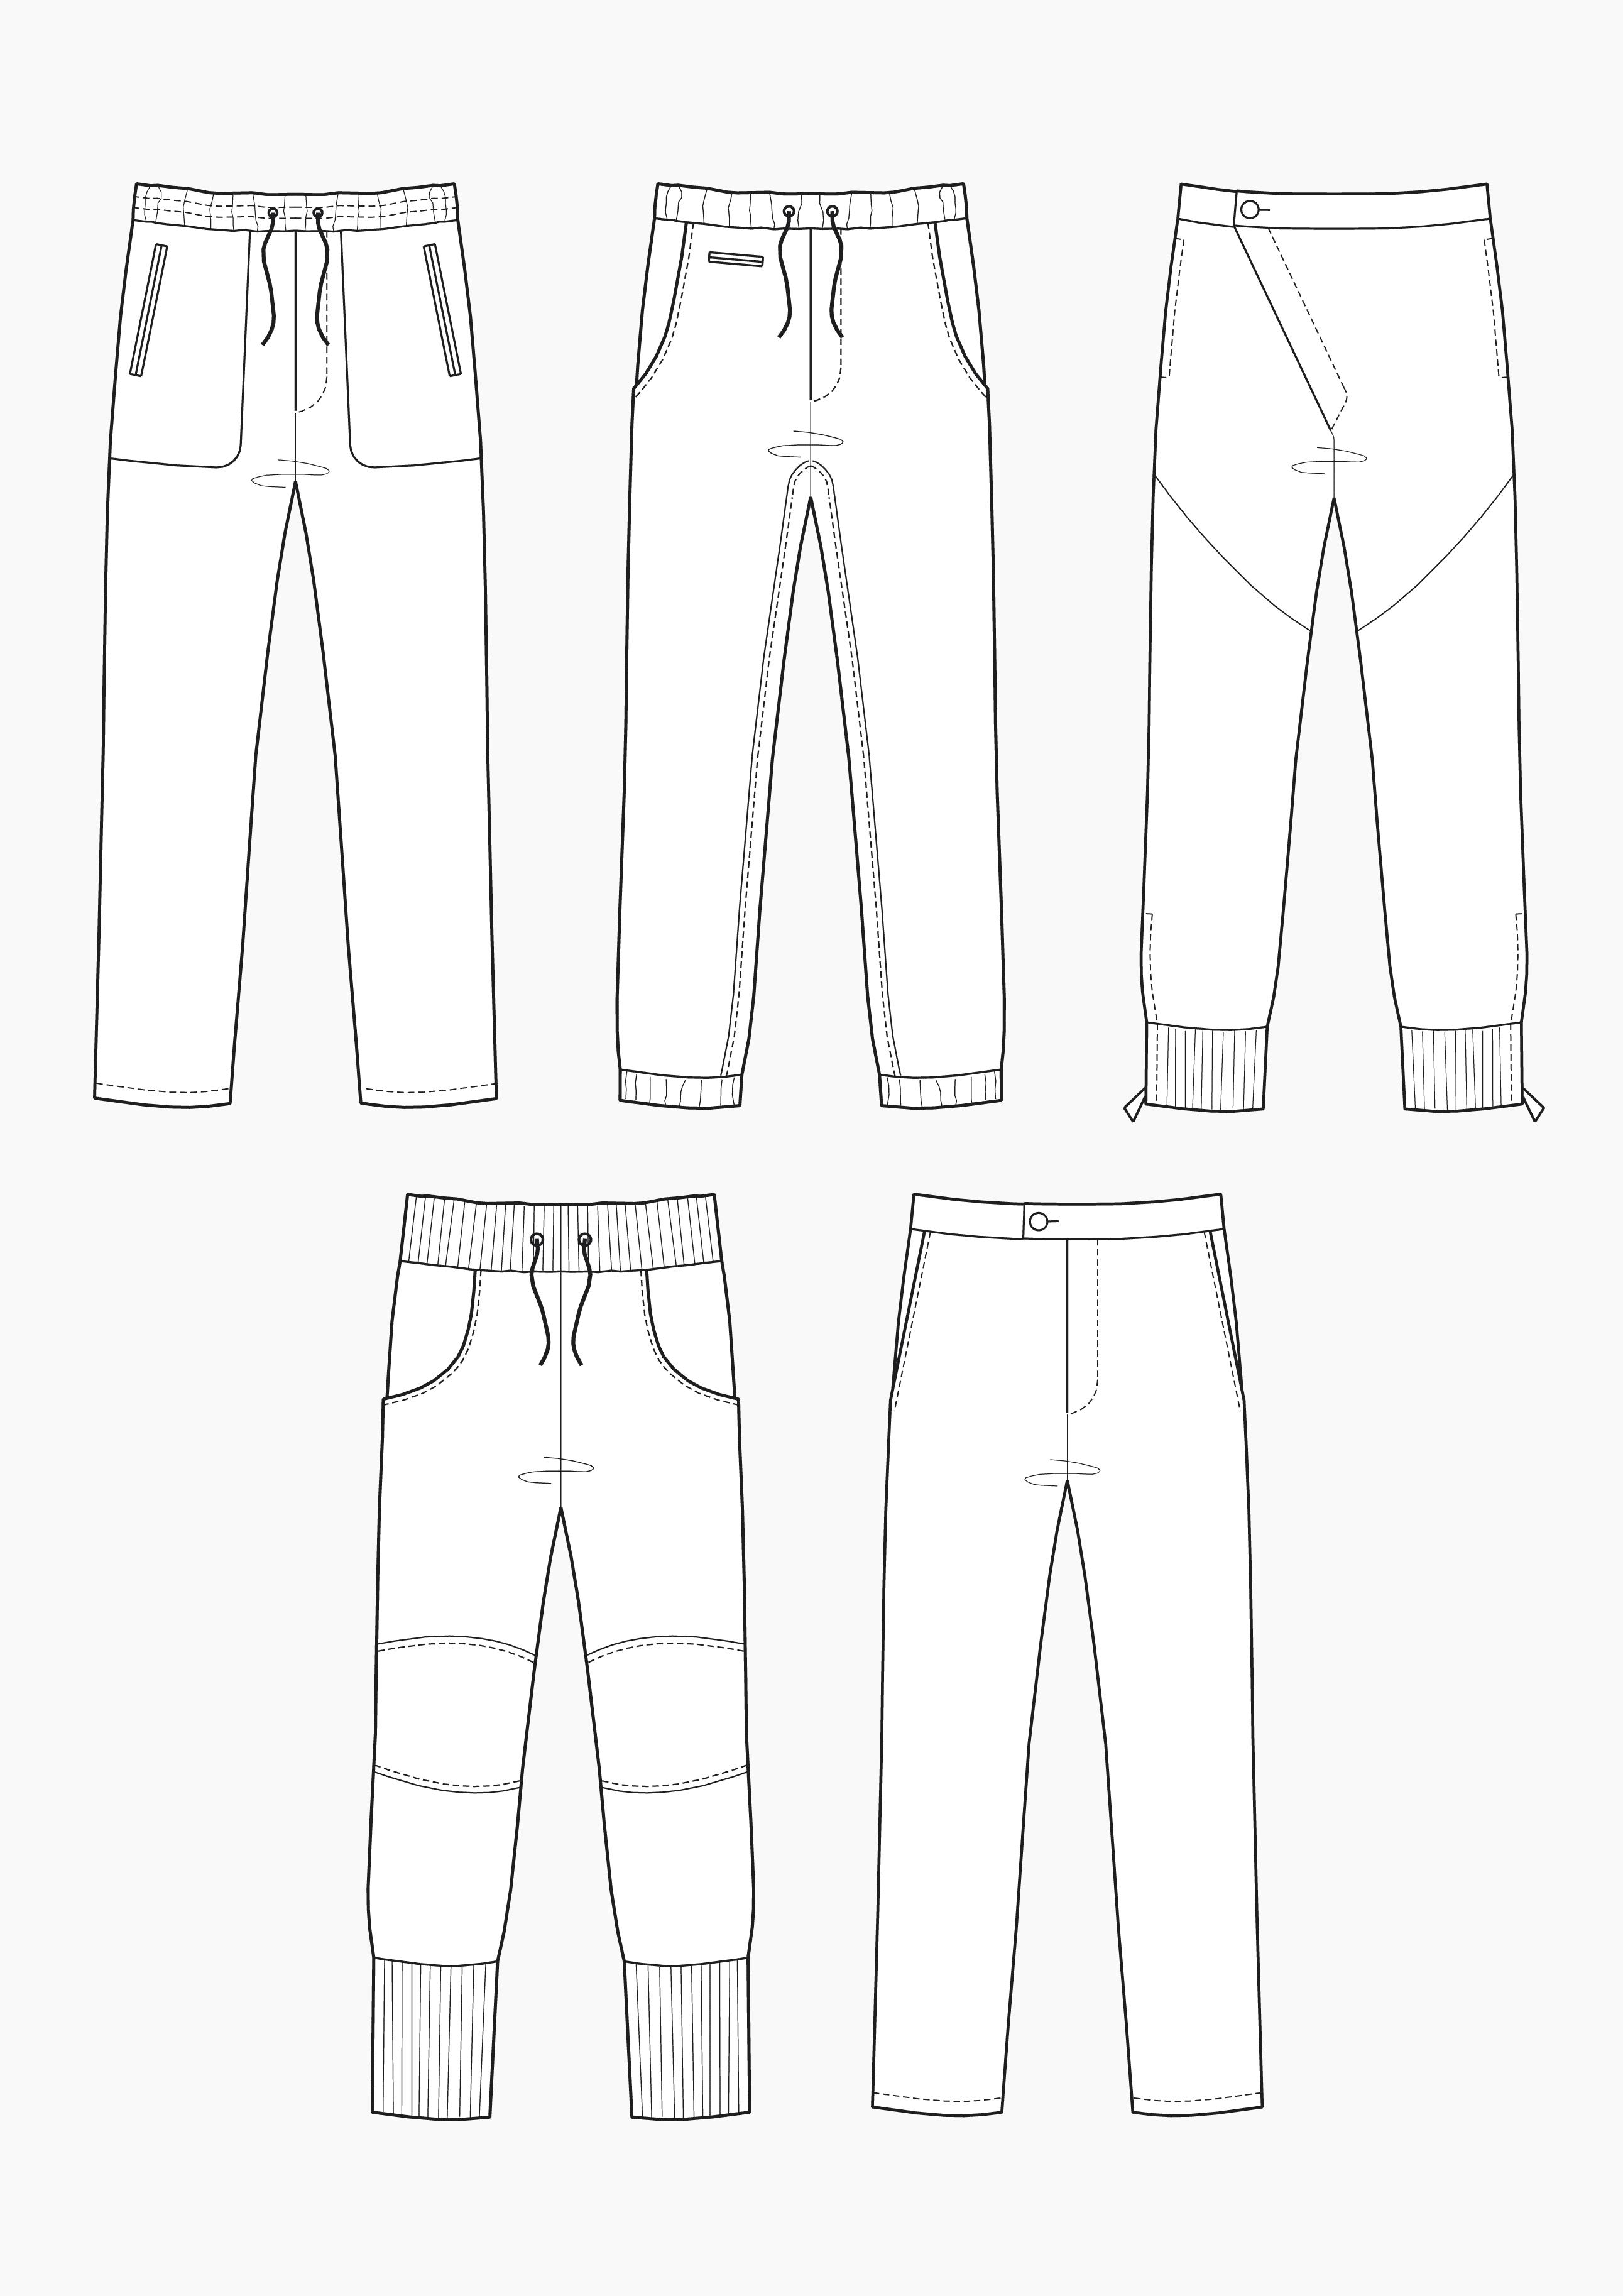 Produkt: Schnitt-Technik Relaxed Pants für Herren